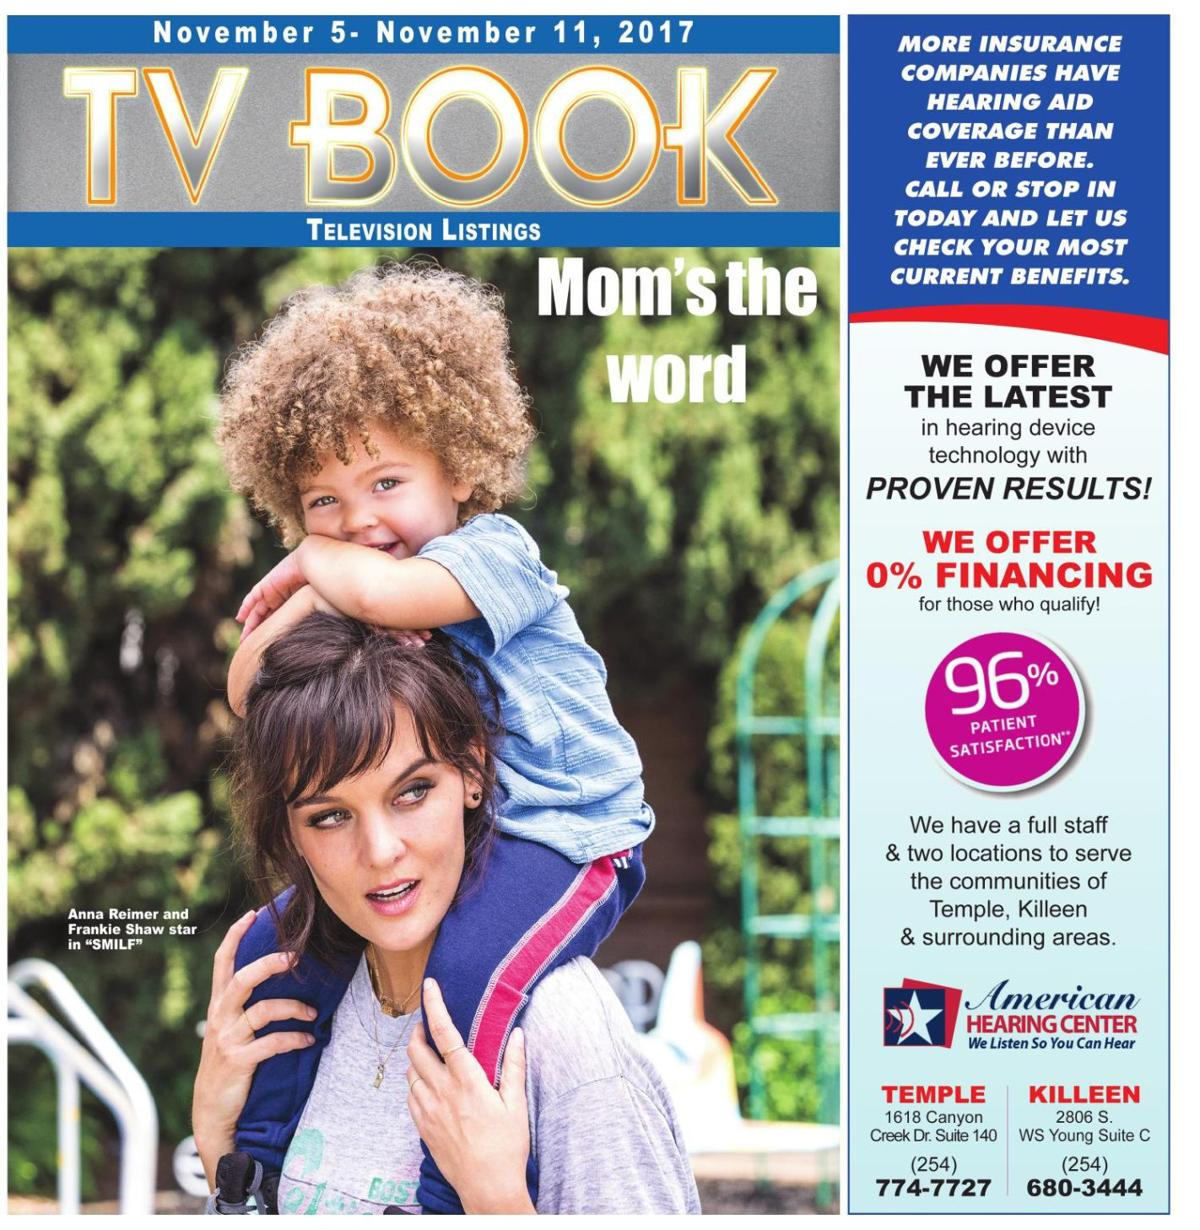 TV Book November 5th - 11th